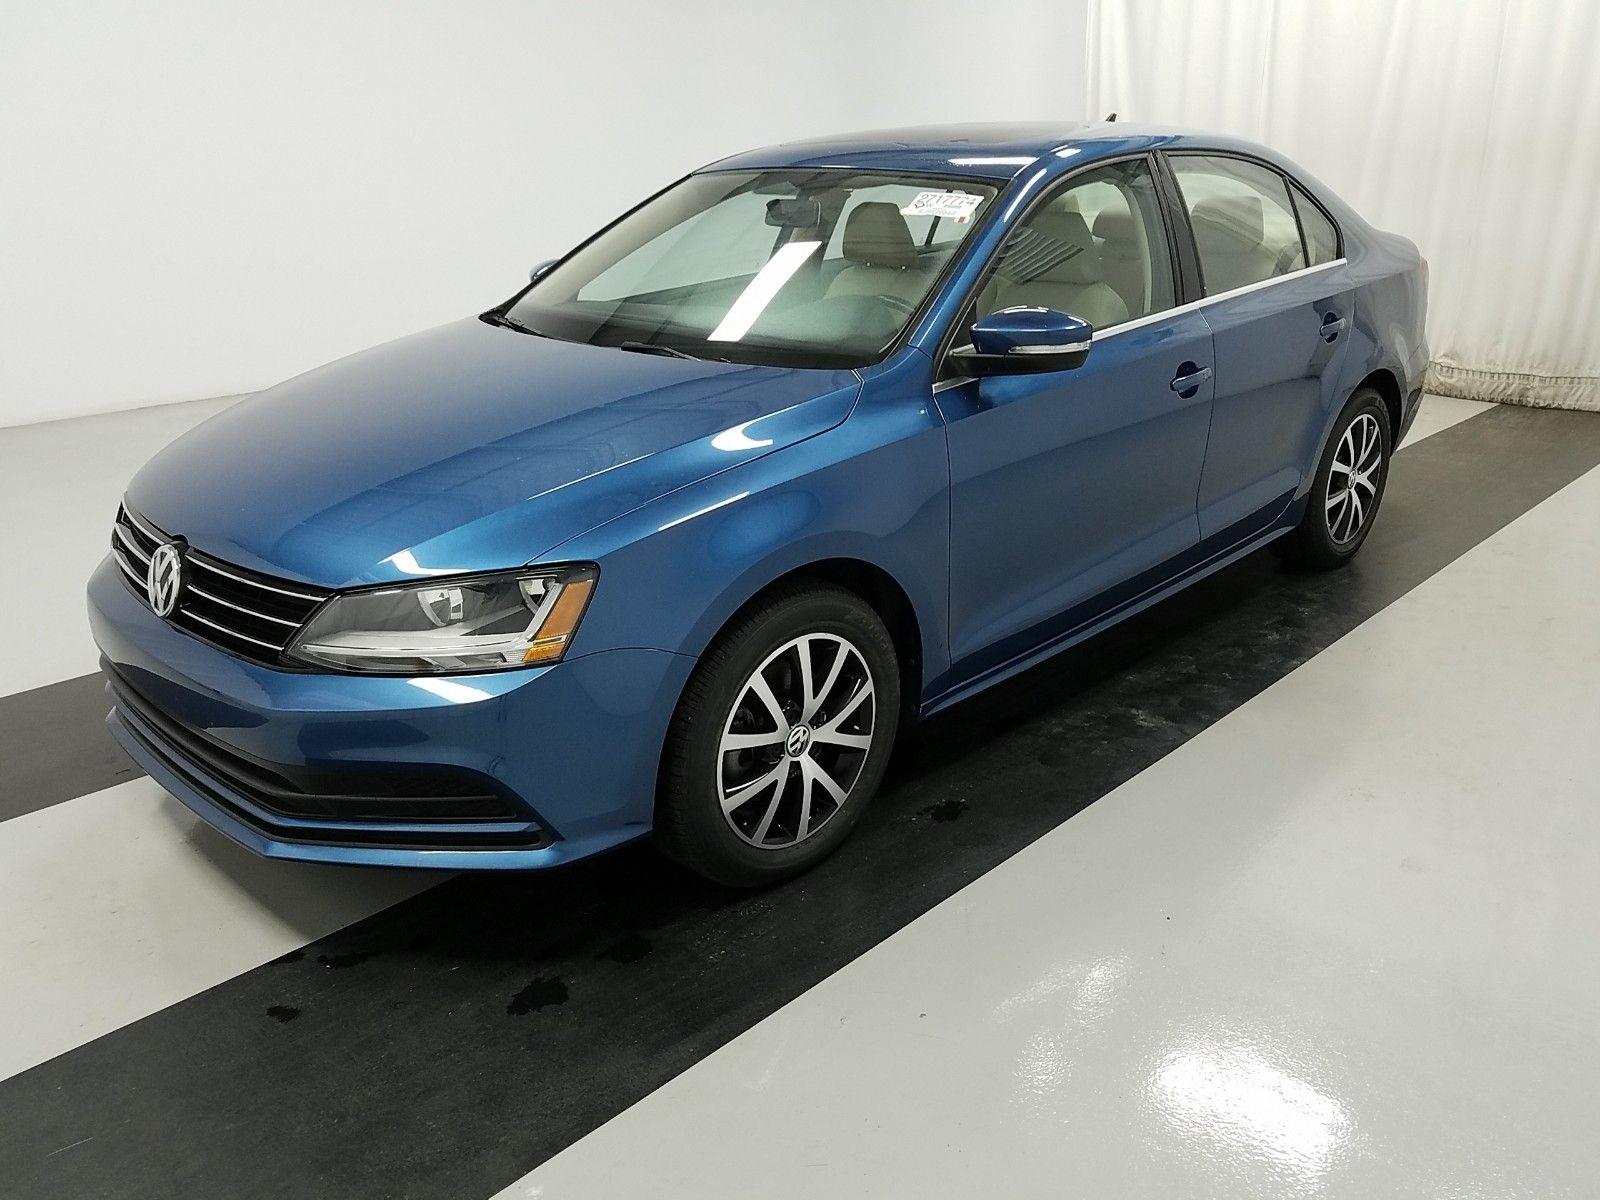 2017 Volkswagen Jetta 1.4. Lot 99914100660 Vin 3VWDB7AJ4HM393633